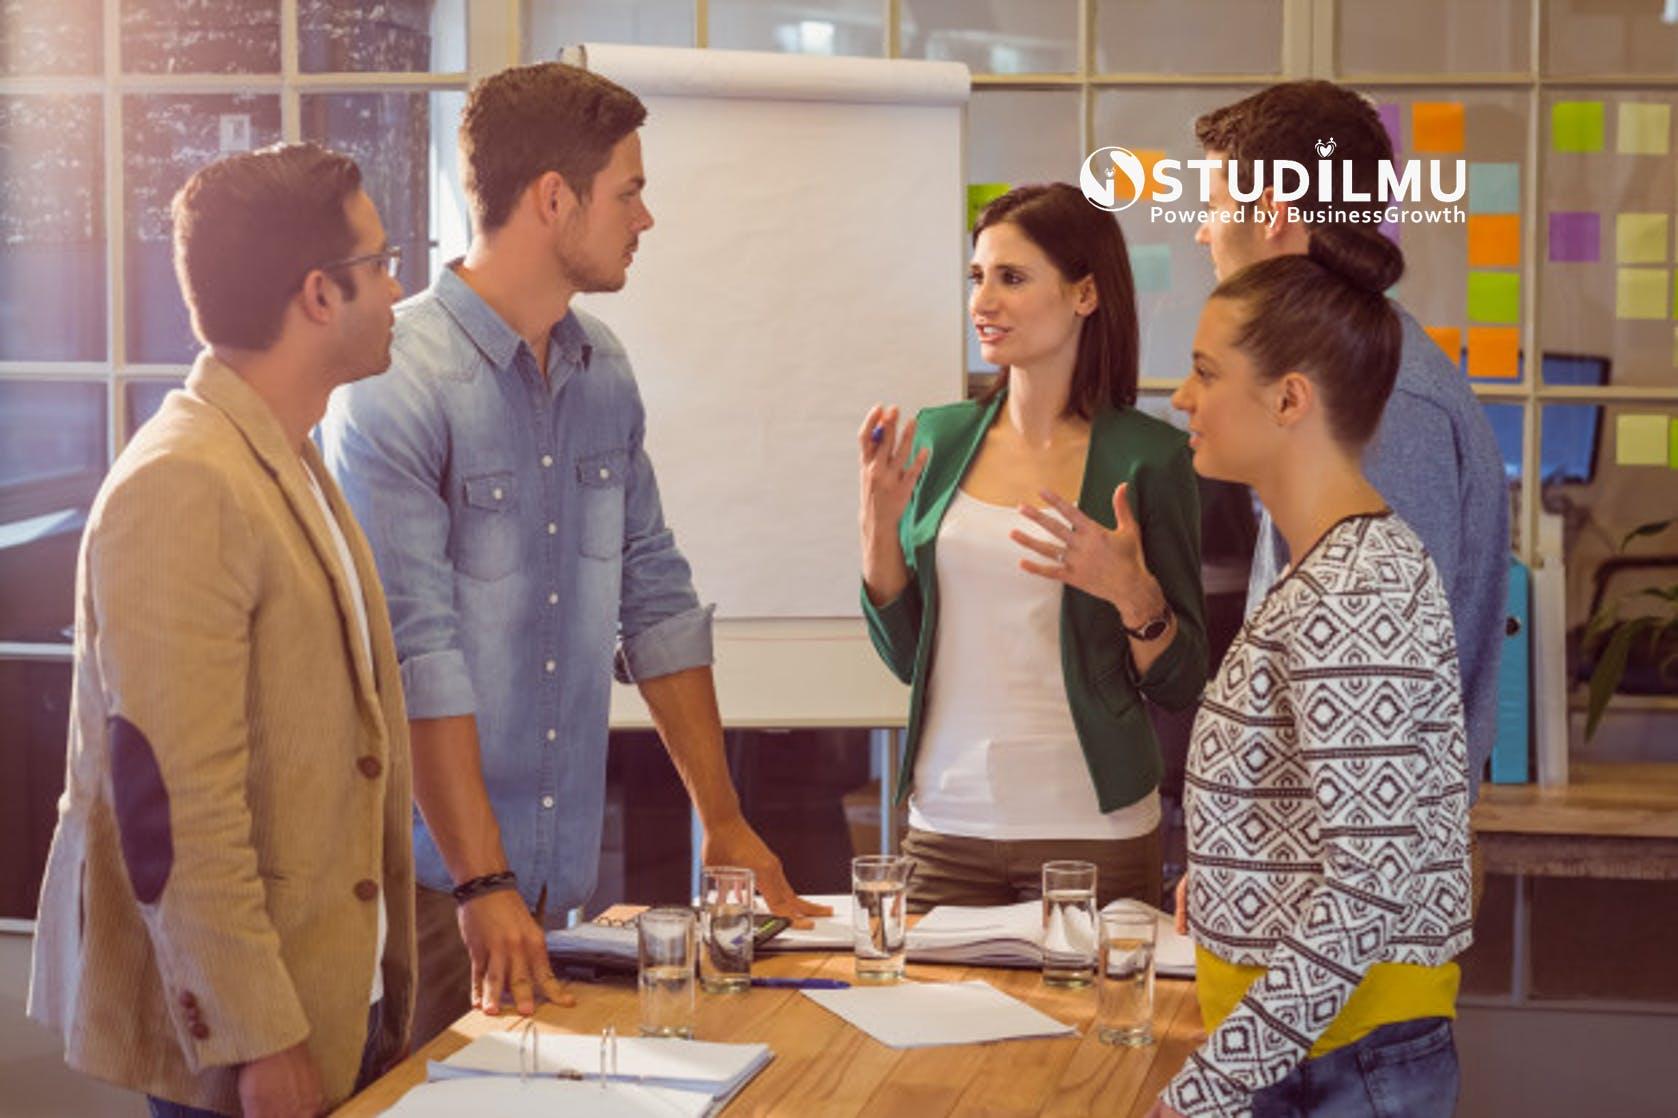 STUDILMU Career Advice - 5 Cara Cepat Mendapatkan Pekerjaan